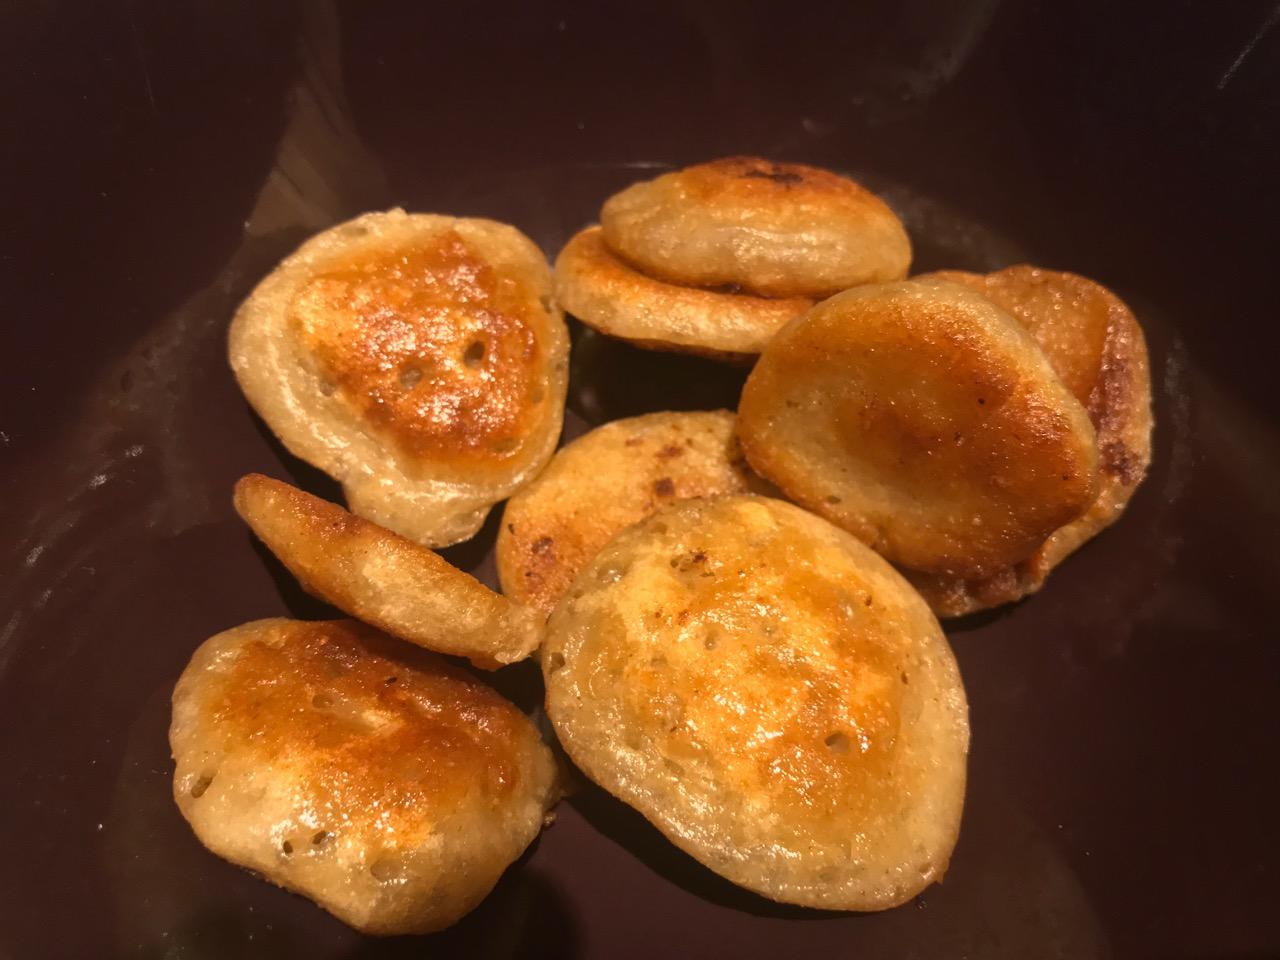 golden sourdough croutons